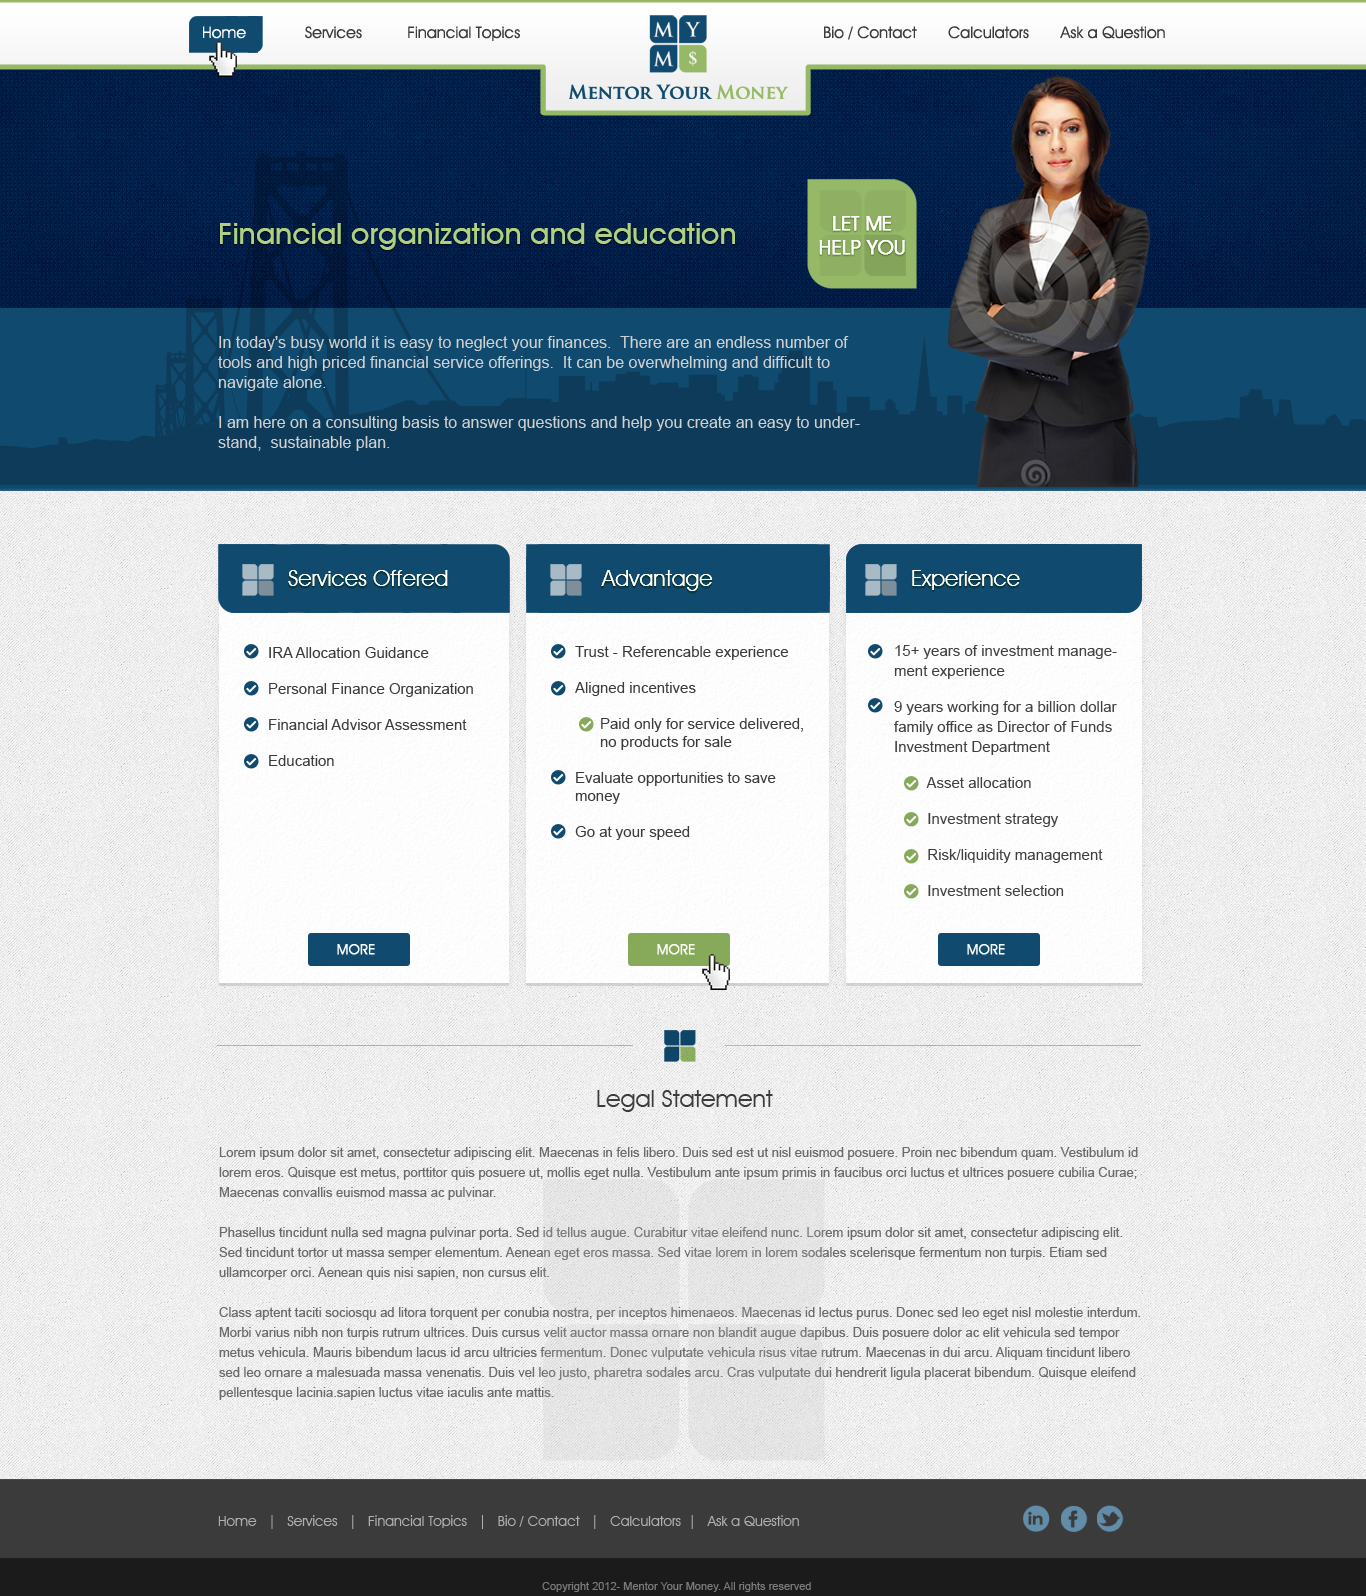 Create the next website design for Mentor Your Money